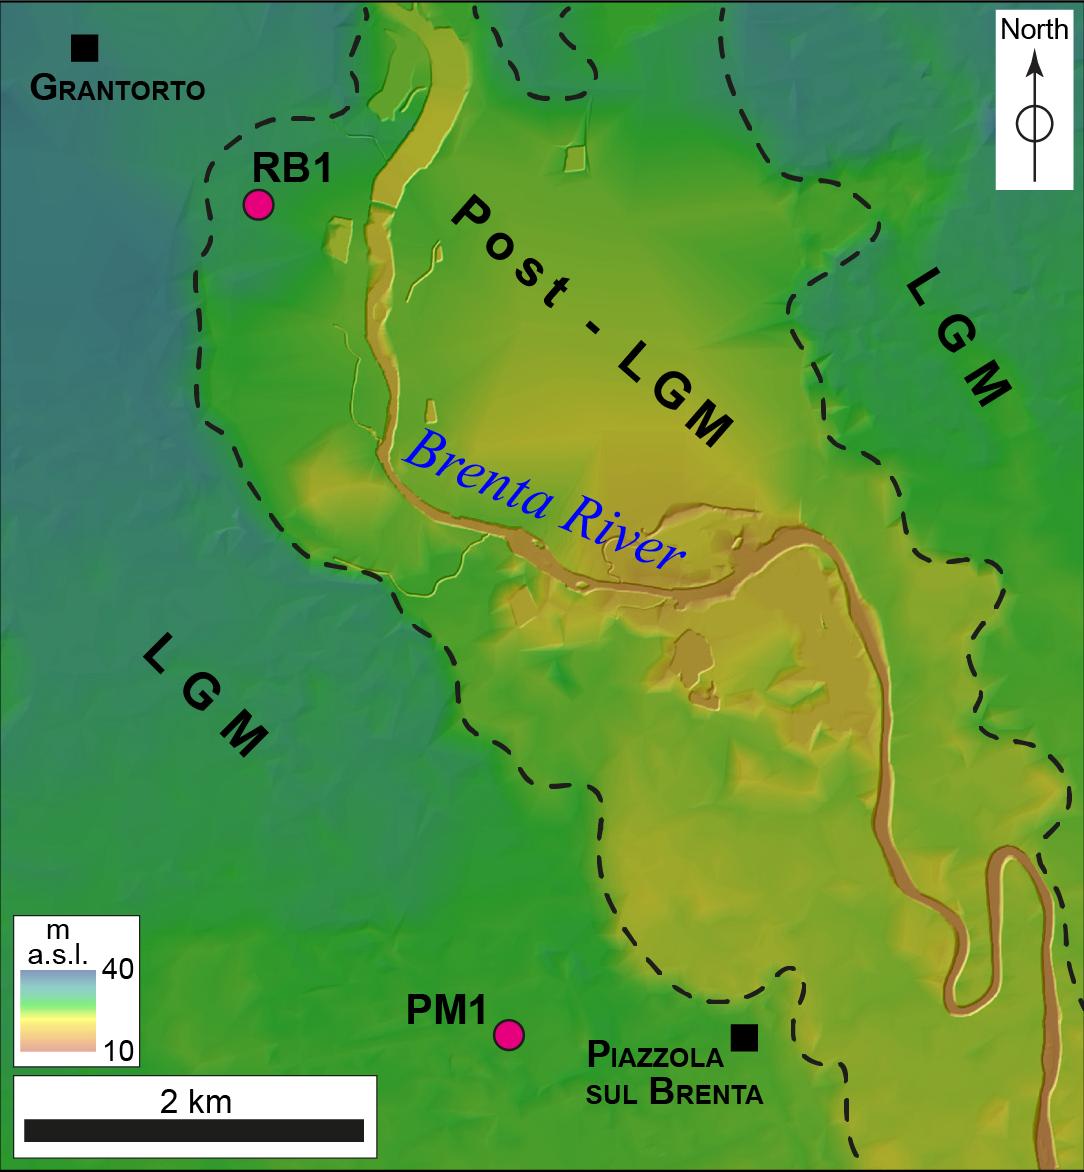 ESurf - Glacial dynamics in pre-Alpine narrow valleys during the